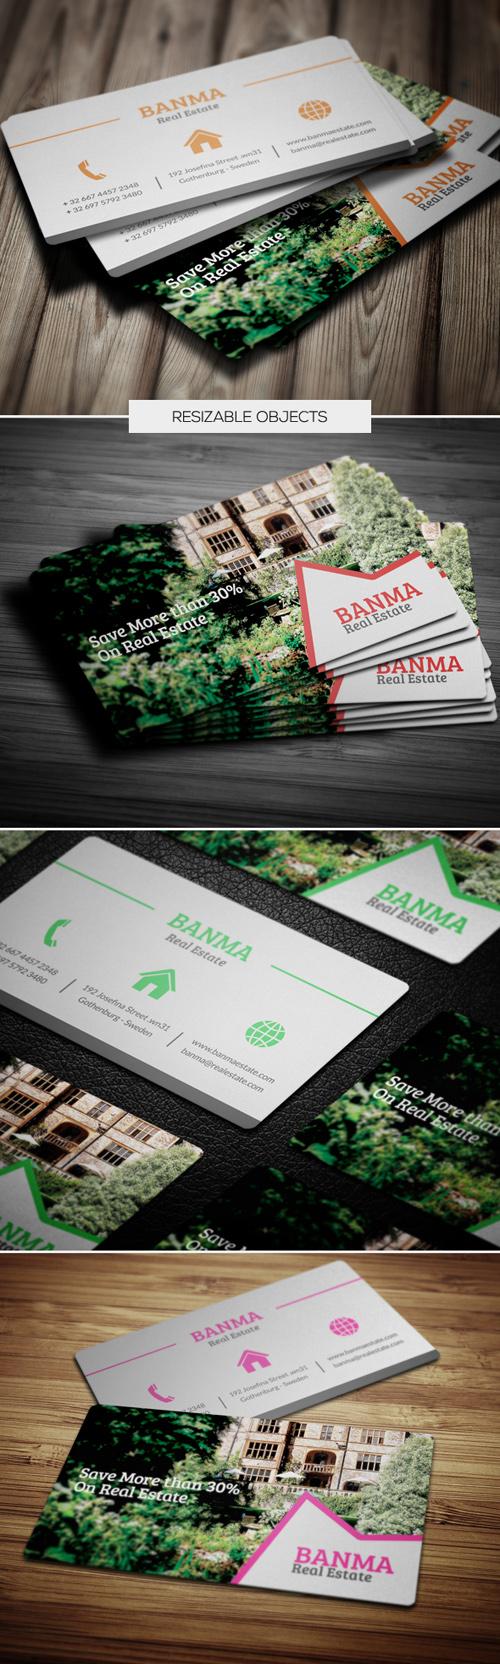 Read Estate Business Cards Design-3